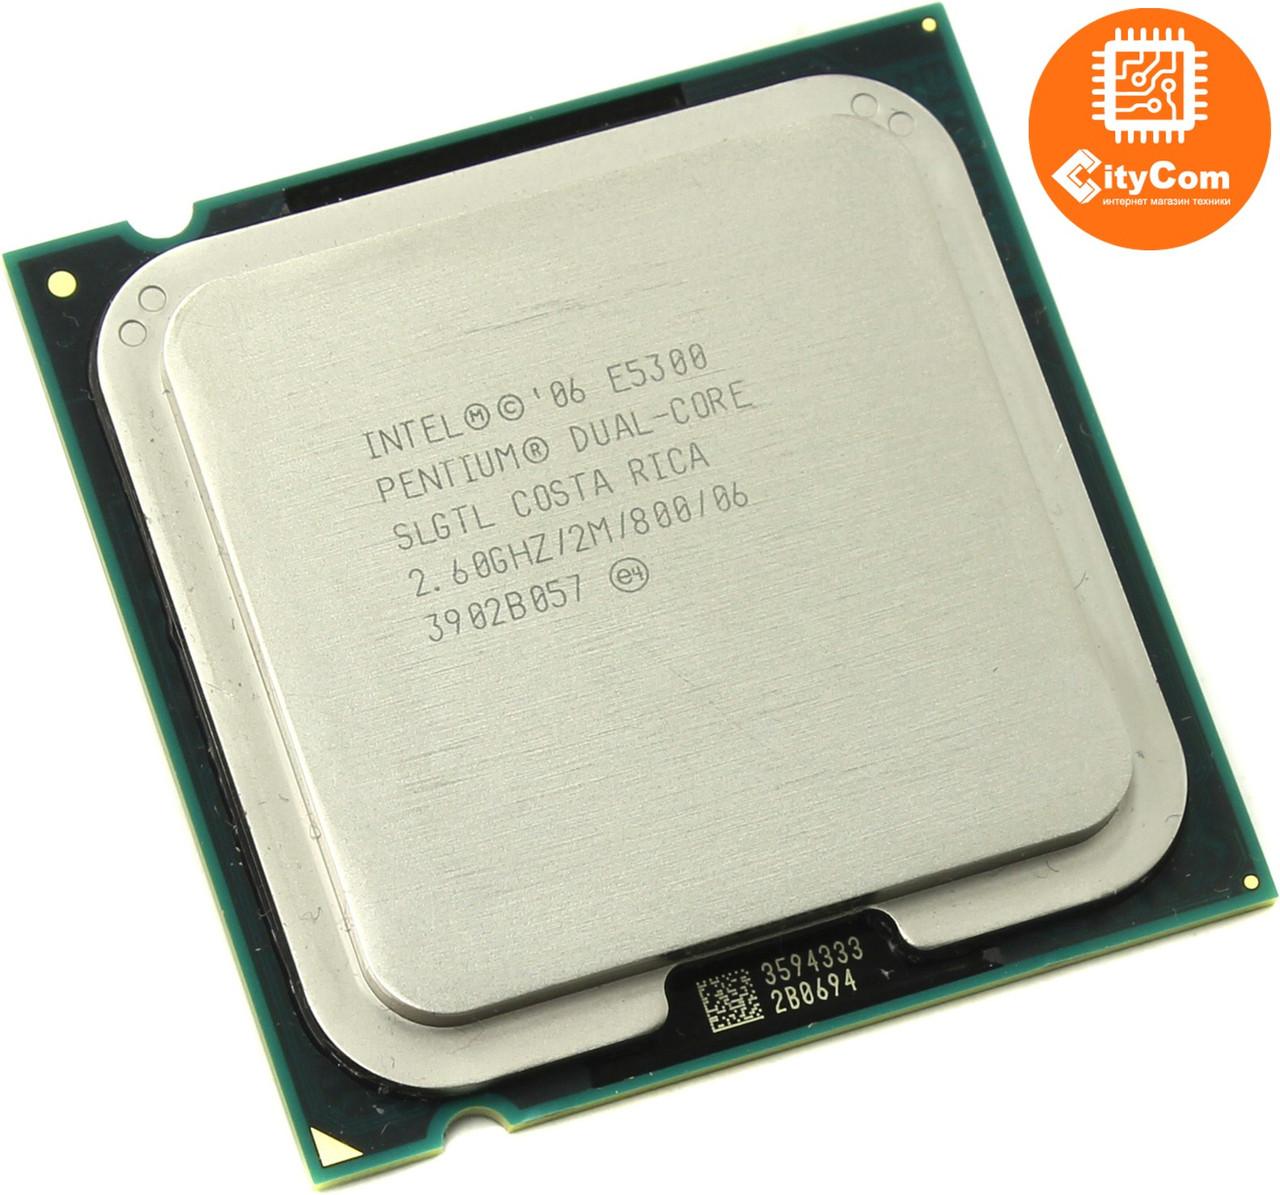 CPU S-775 Intel Pentium DualCore E2220 2.4GHz Арт.1376